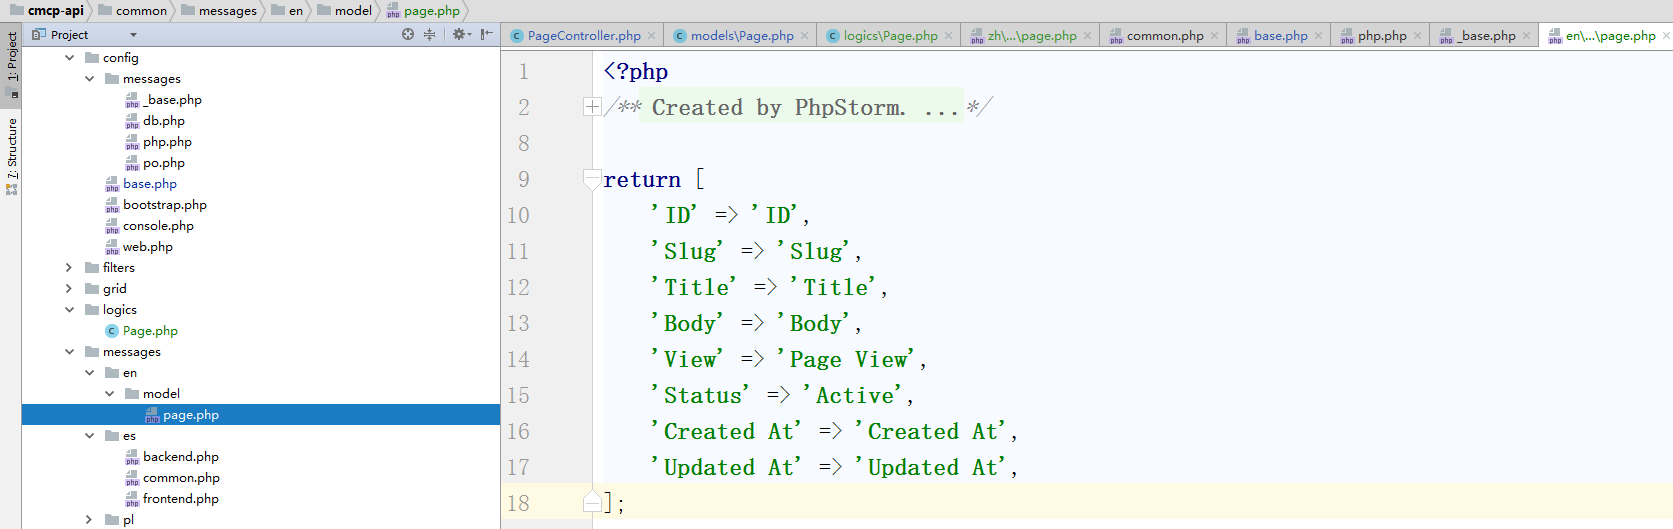 新建 \common\messages\en\model\page.php,支持目标语言为英语美国时的消息翻译